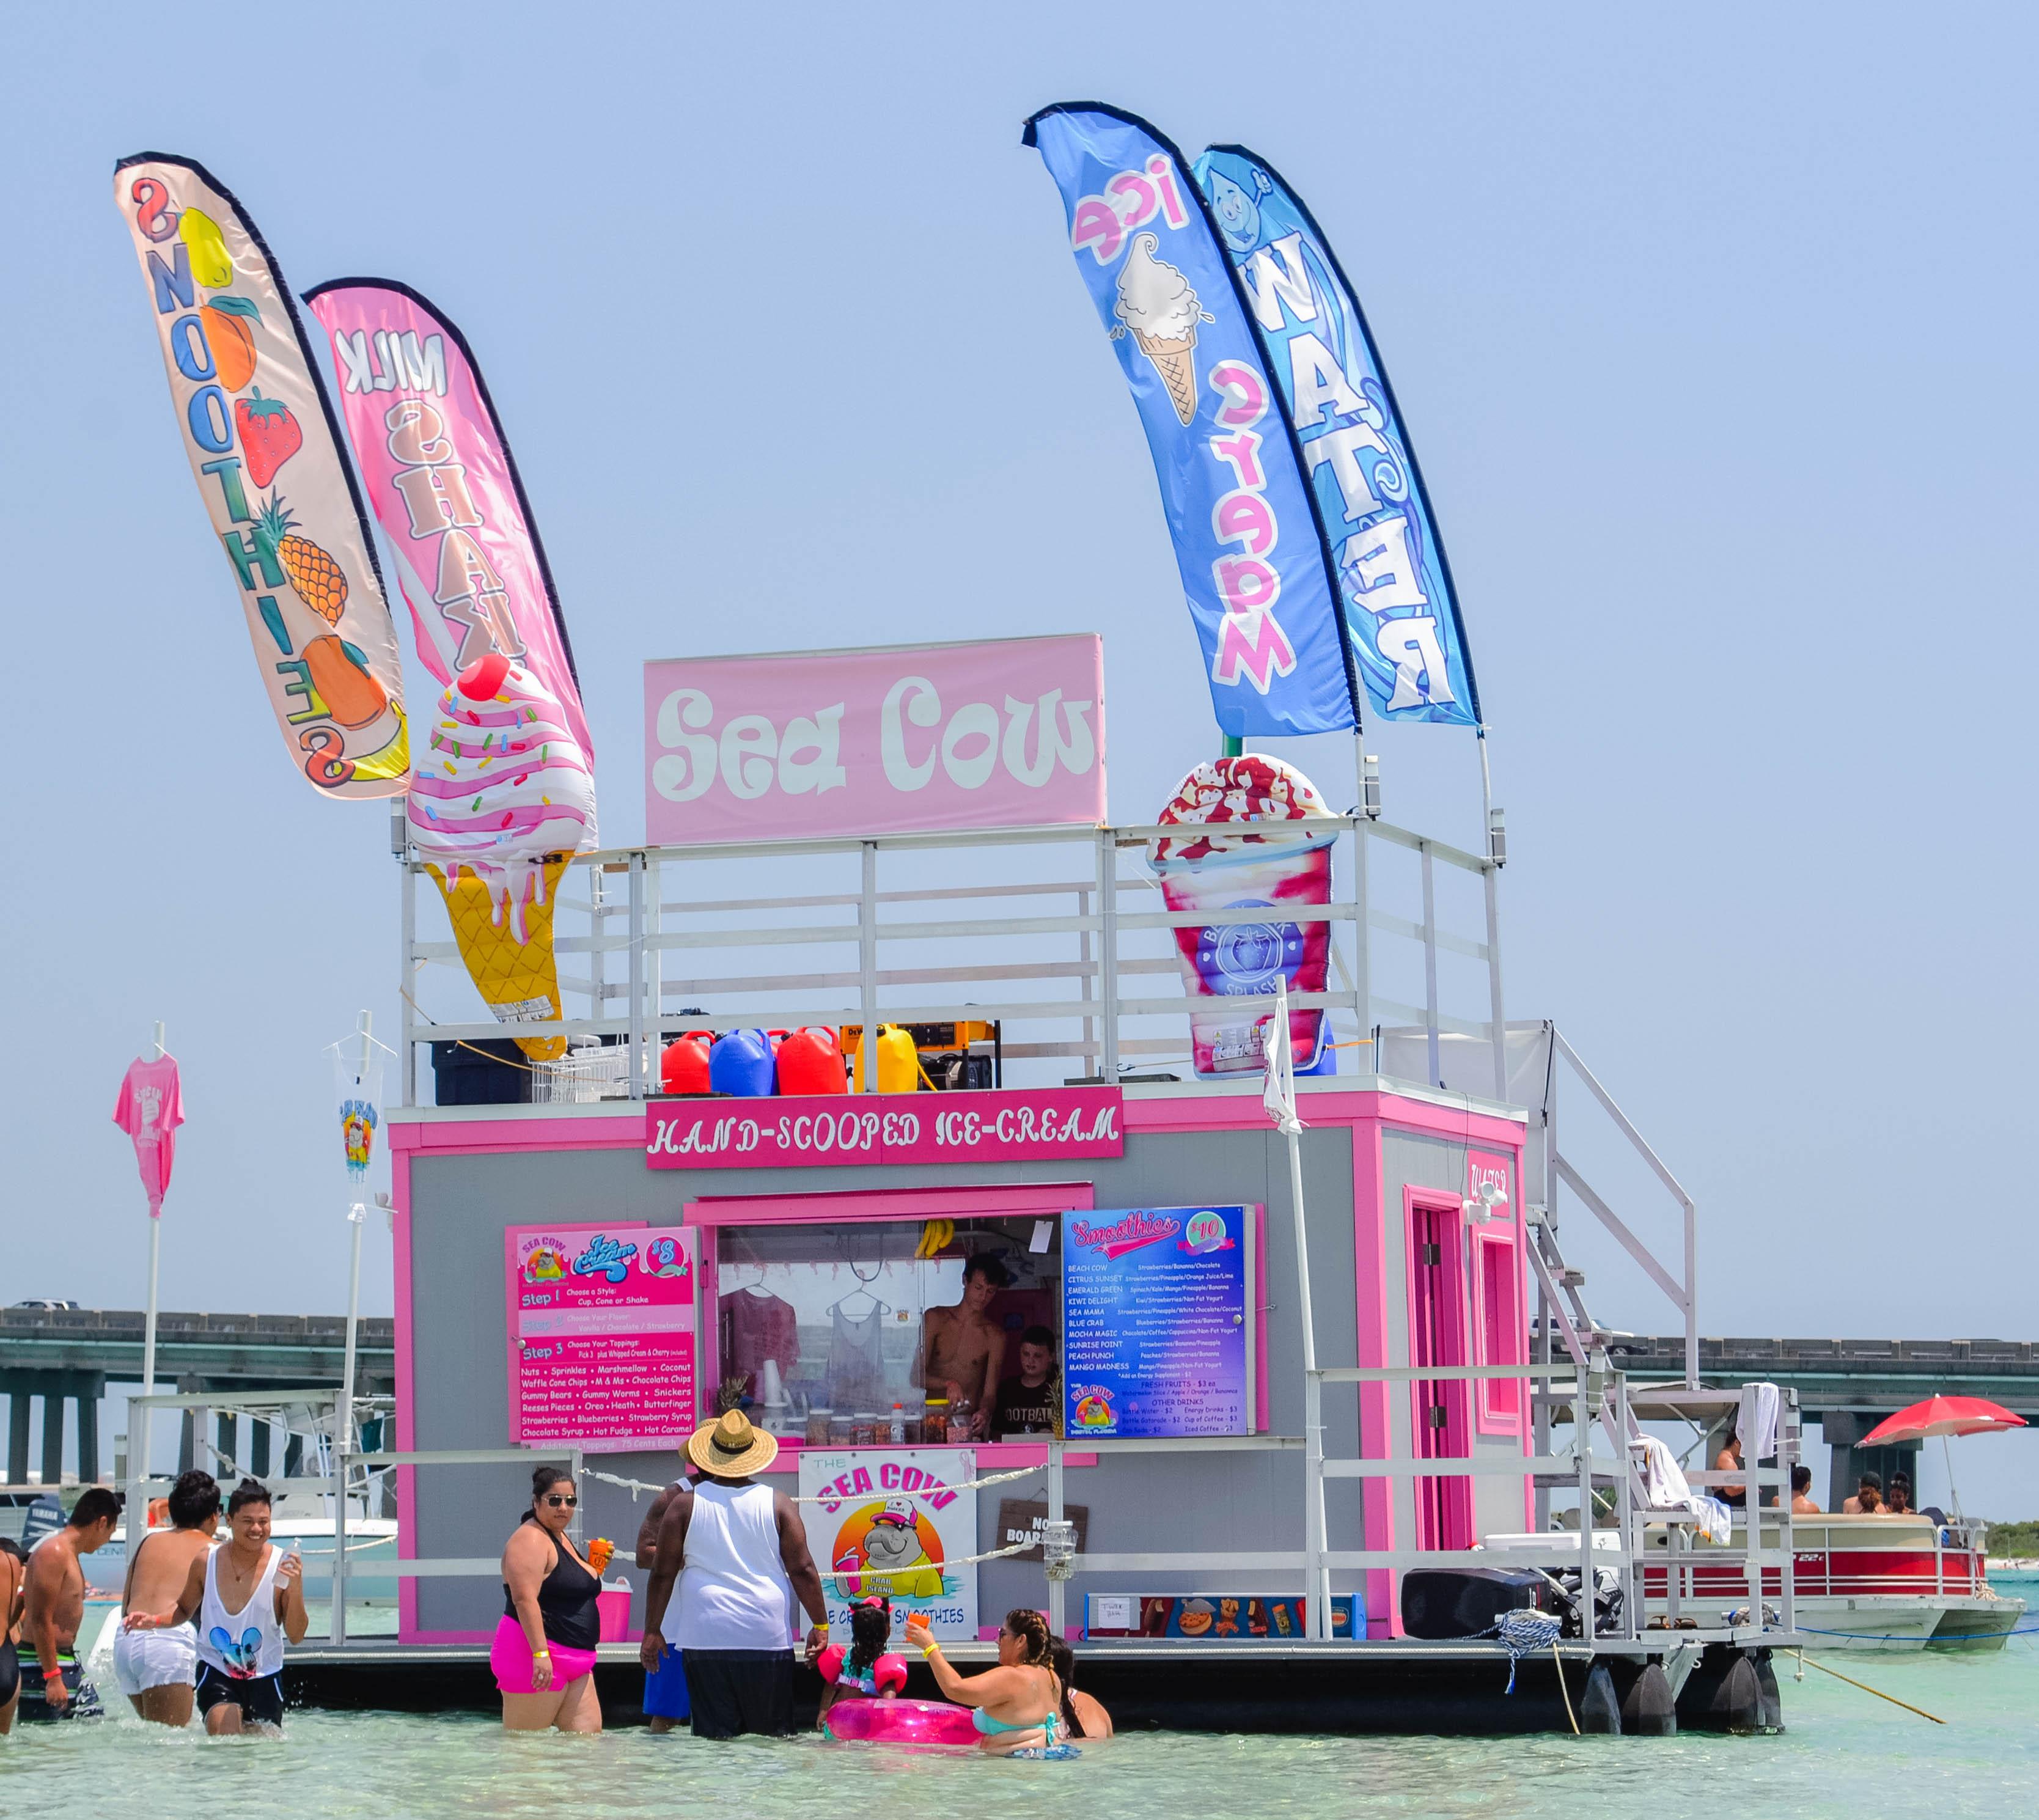 Destin Fl: Crab Island In Destin, Florida: What Locals Don't Tell You